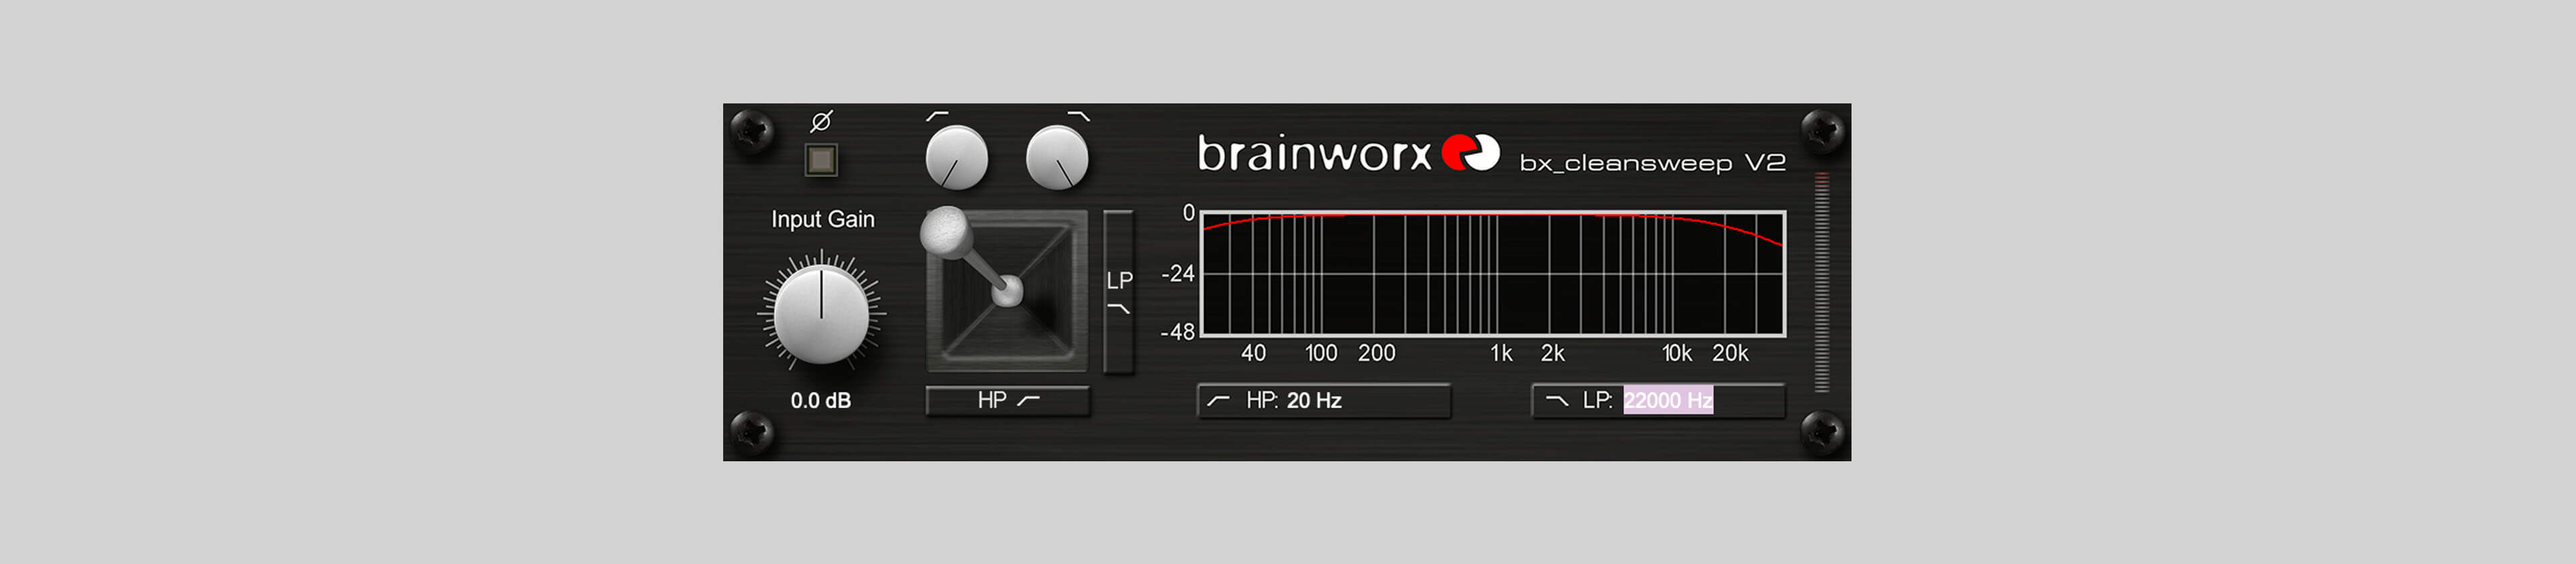 brainworx bx_digital v2 free download